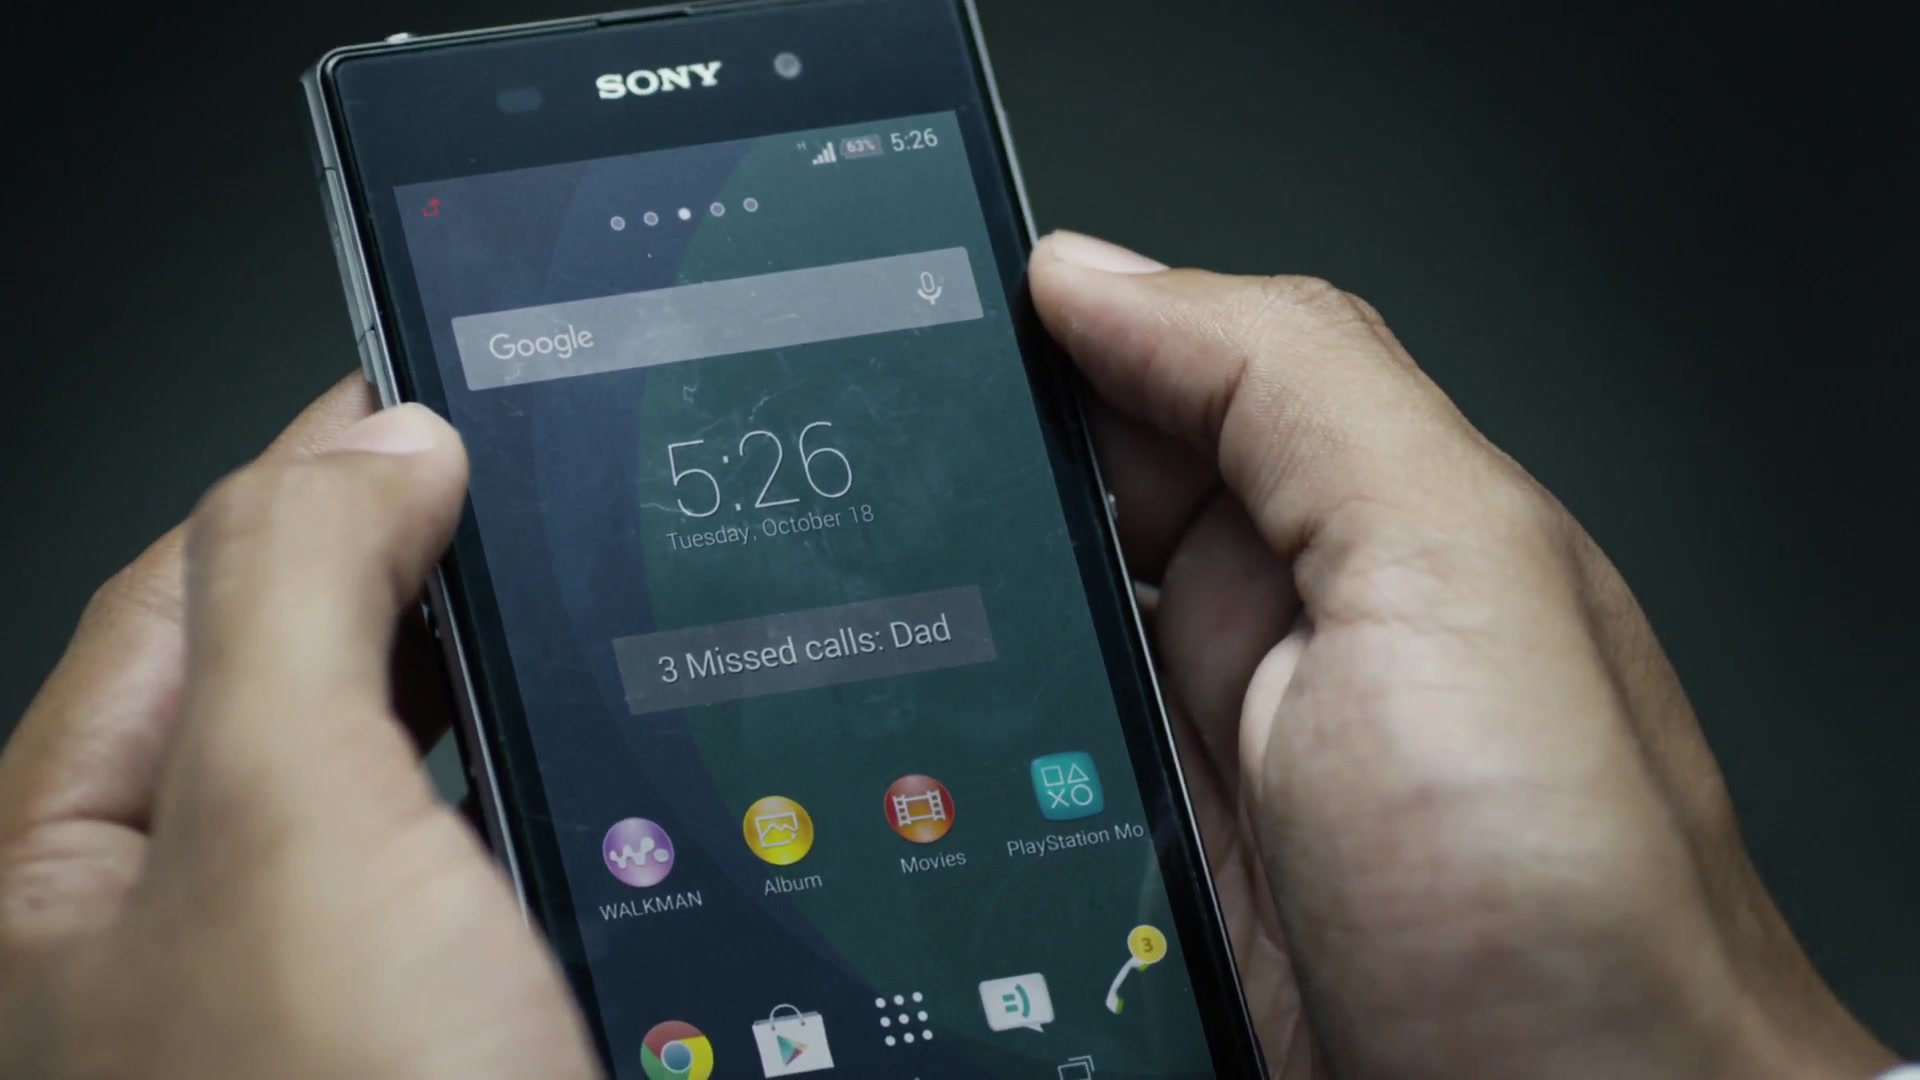 Sony Phone To Tv